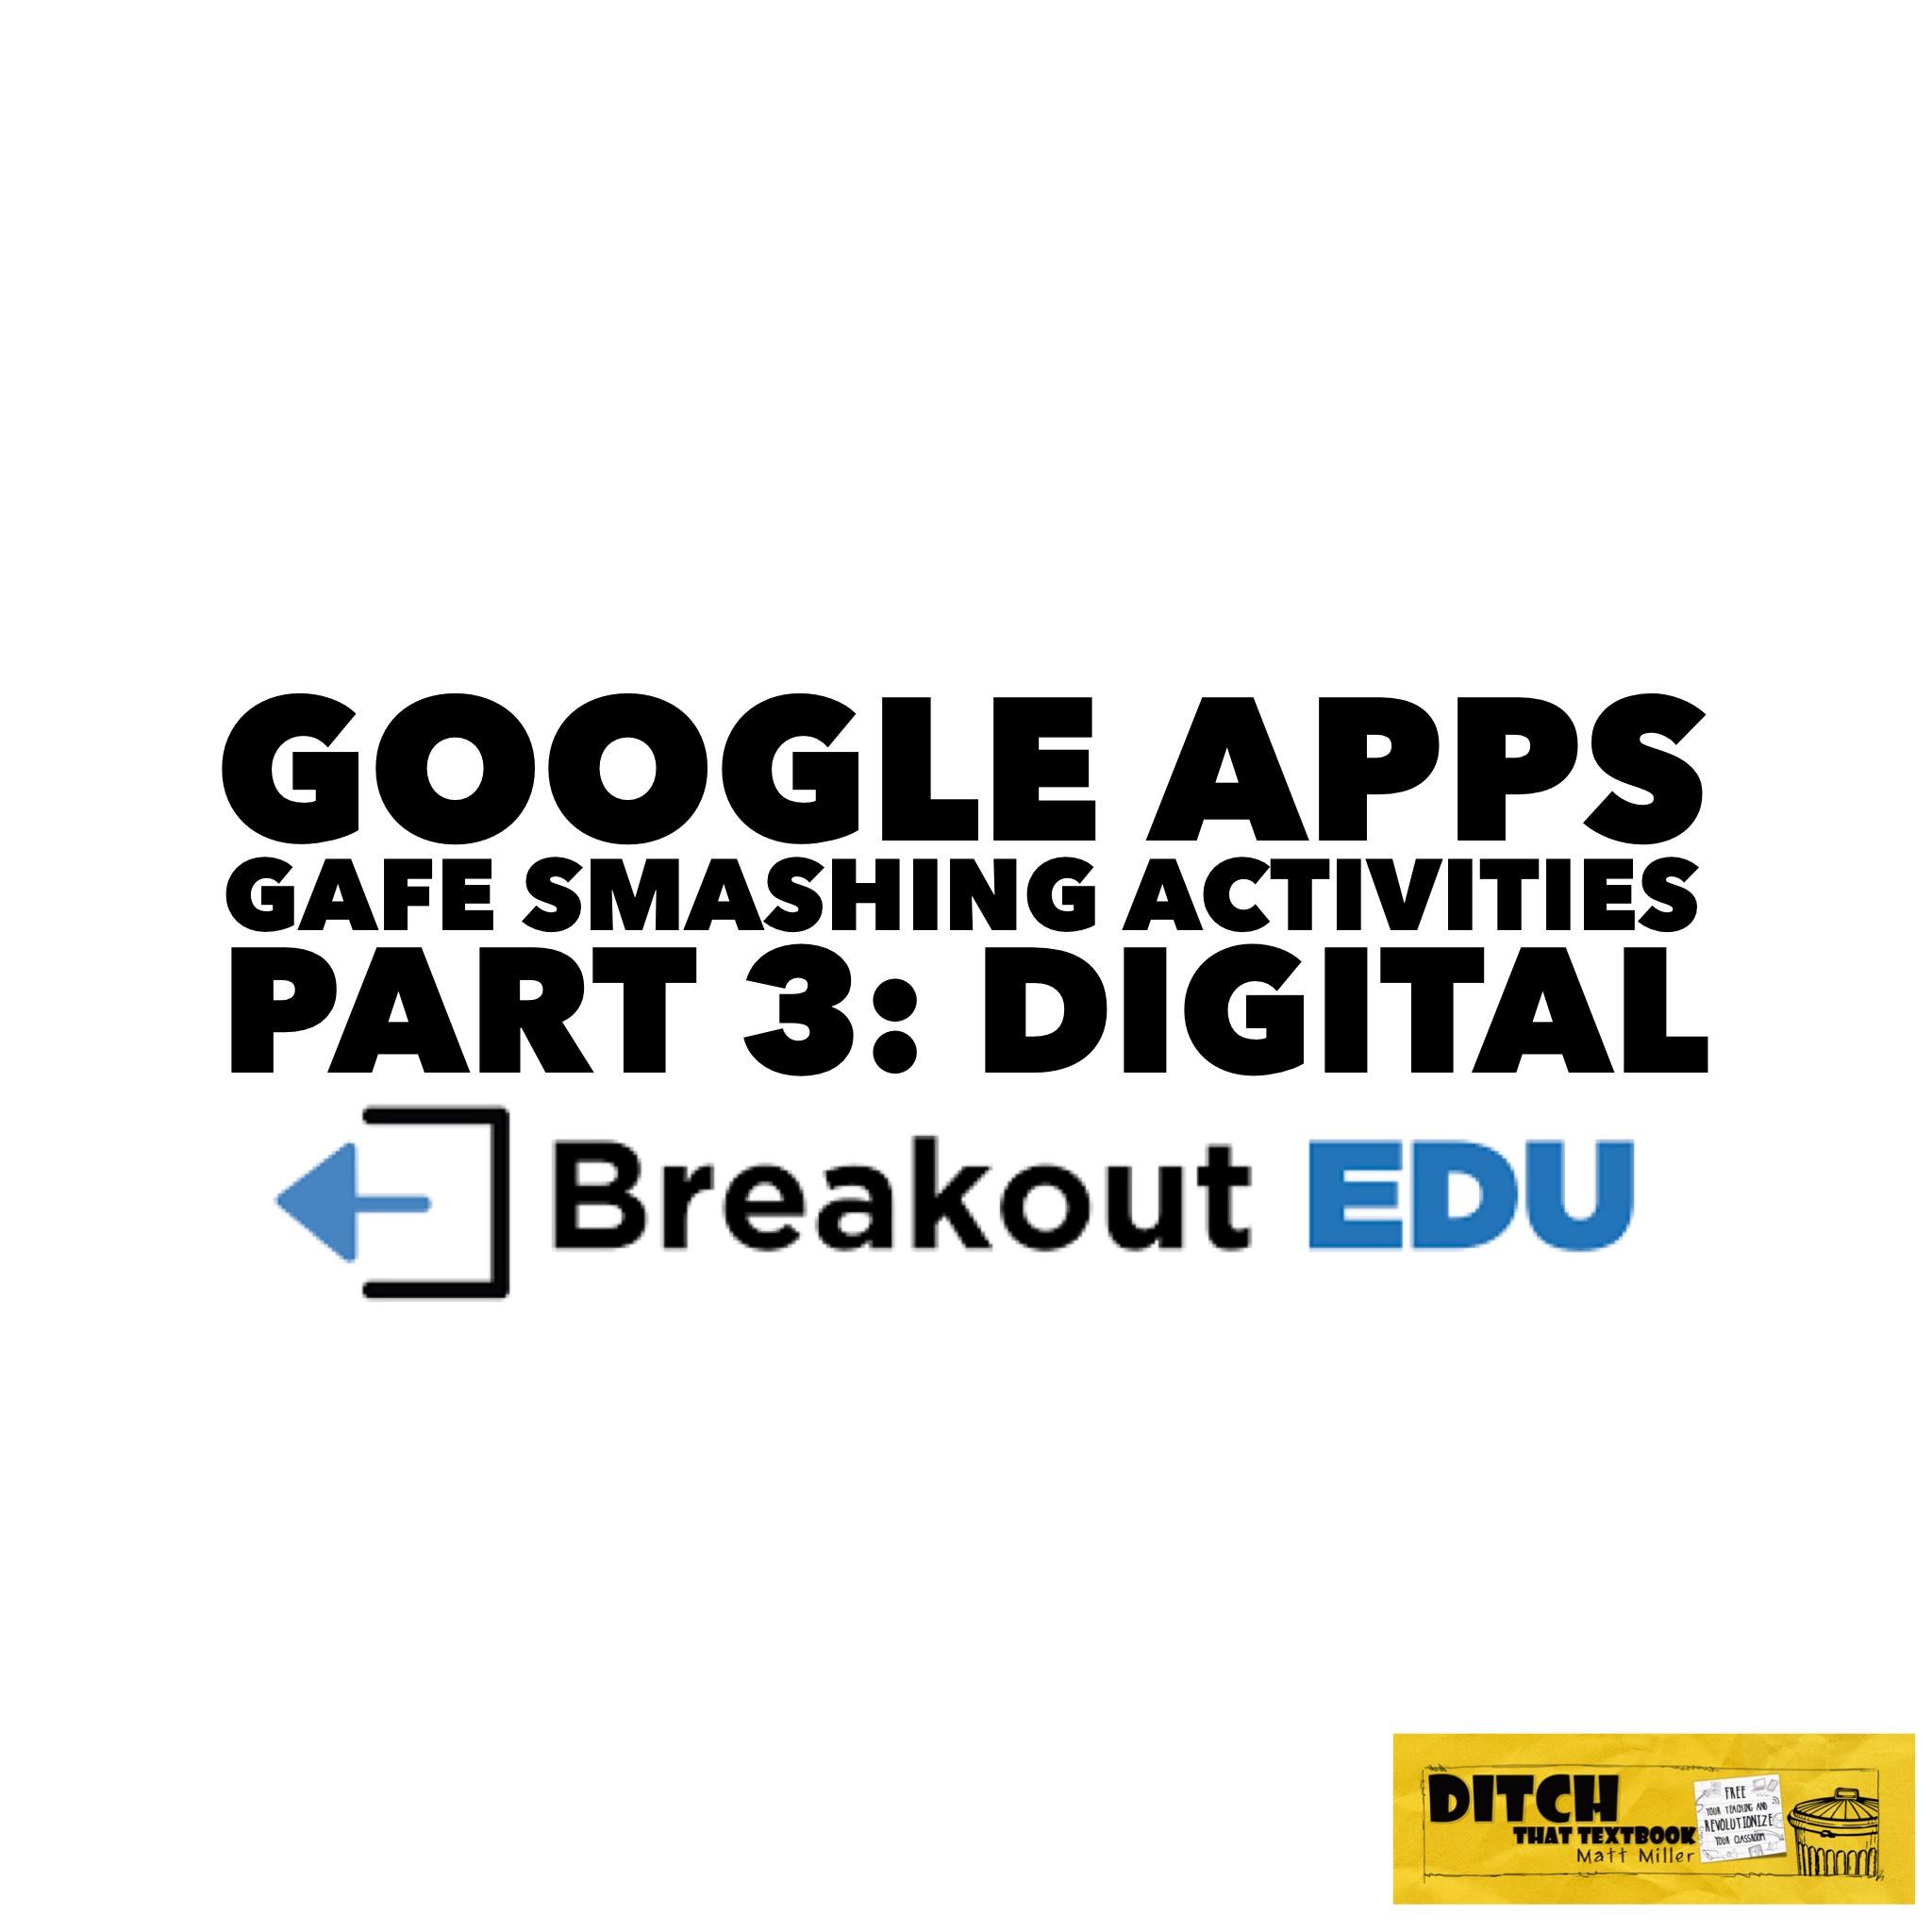 Google Apps Gafe Smashing Activities Part 3 Breakout